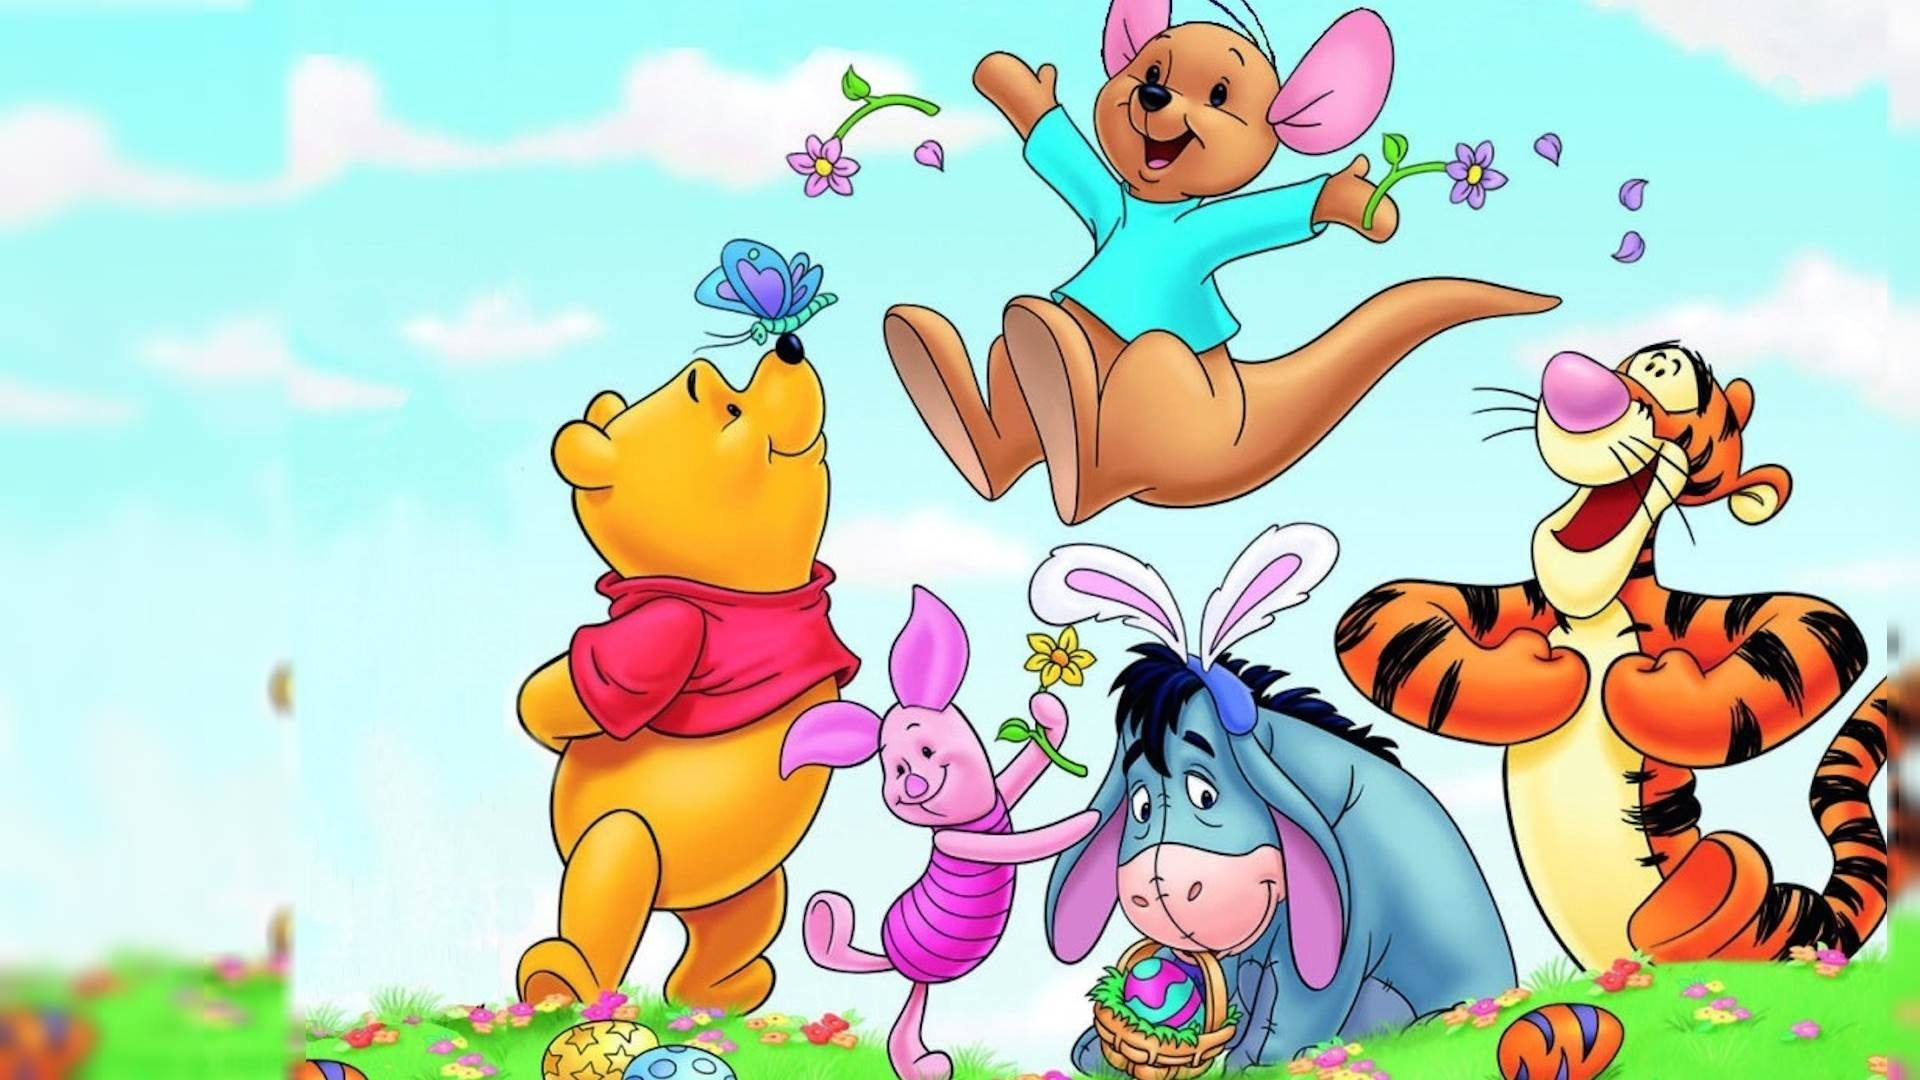 High Resolution Disney Cartoon Winnie The Pooh Wallpaper